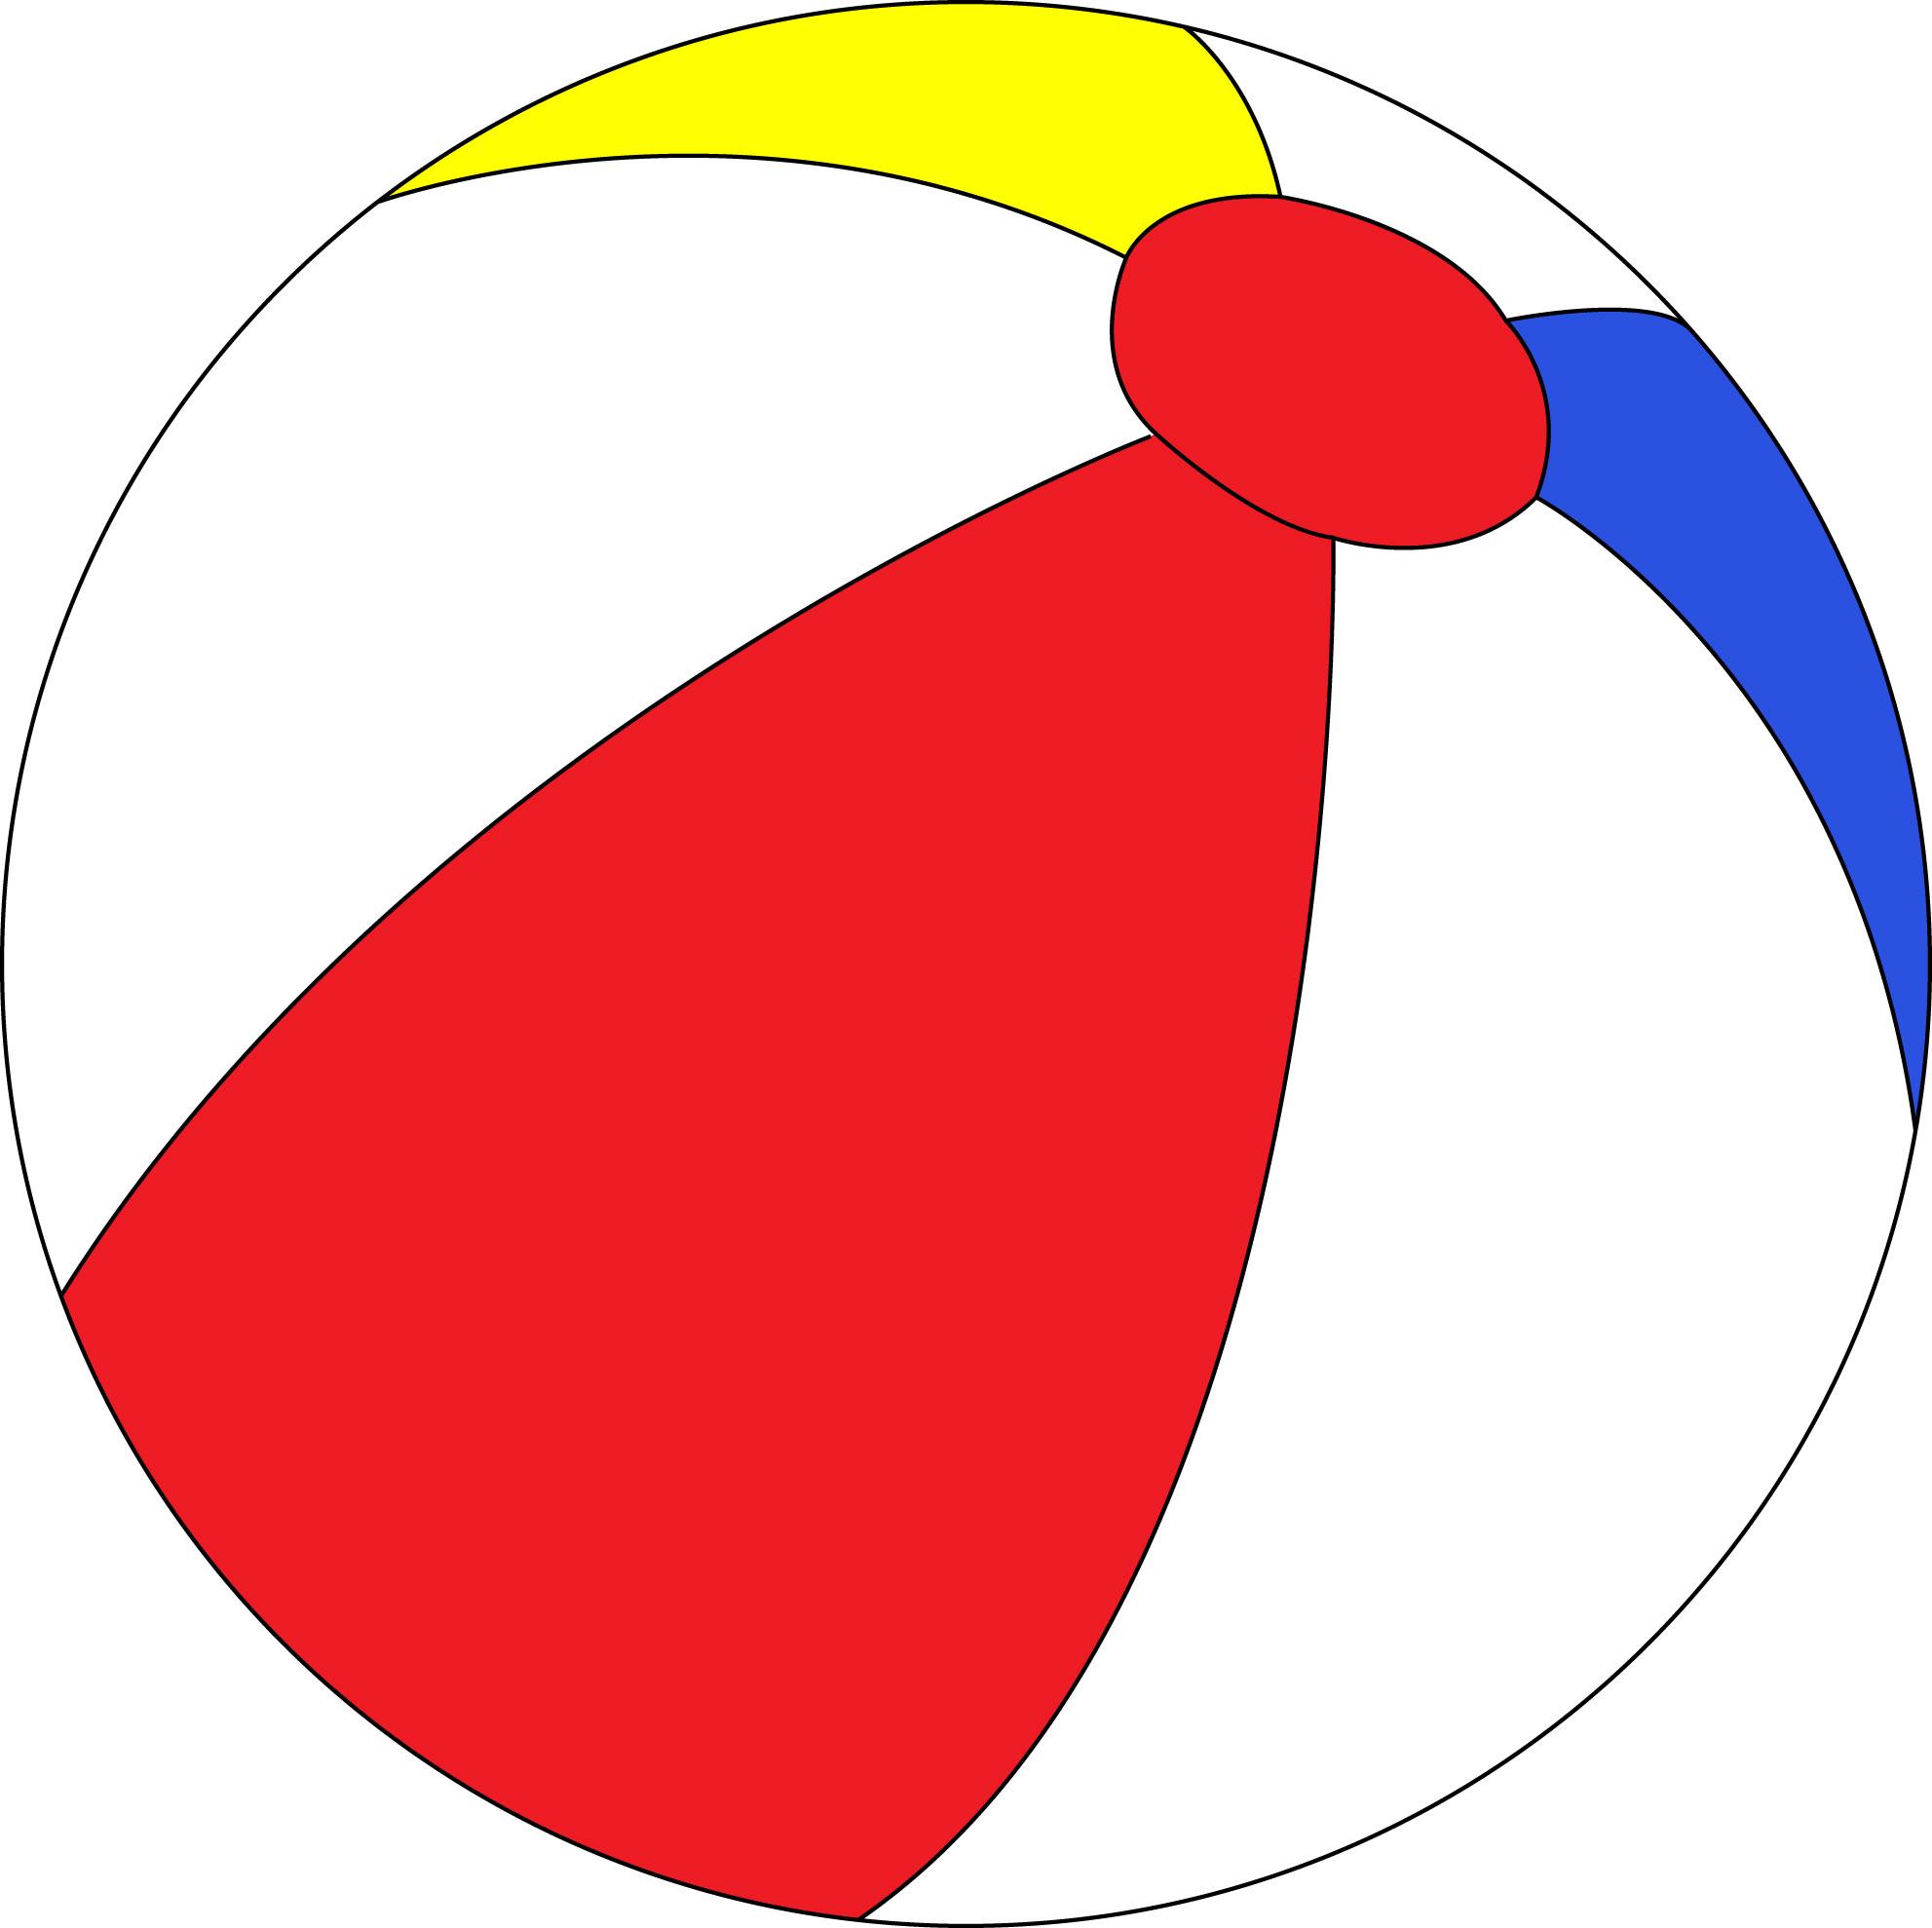 hight resolution of beach ball clip art image 18123